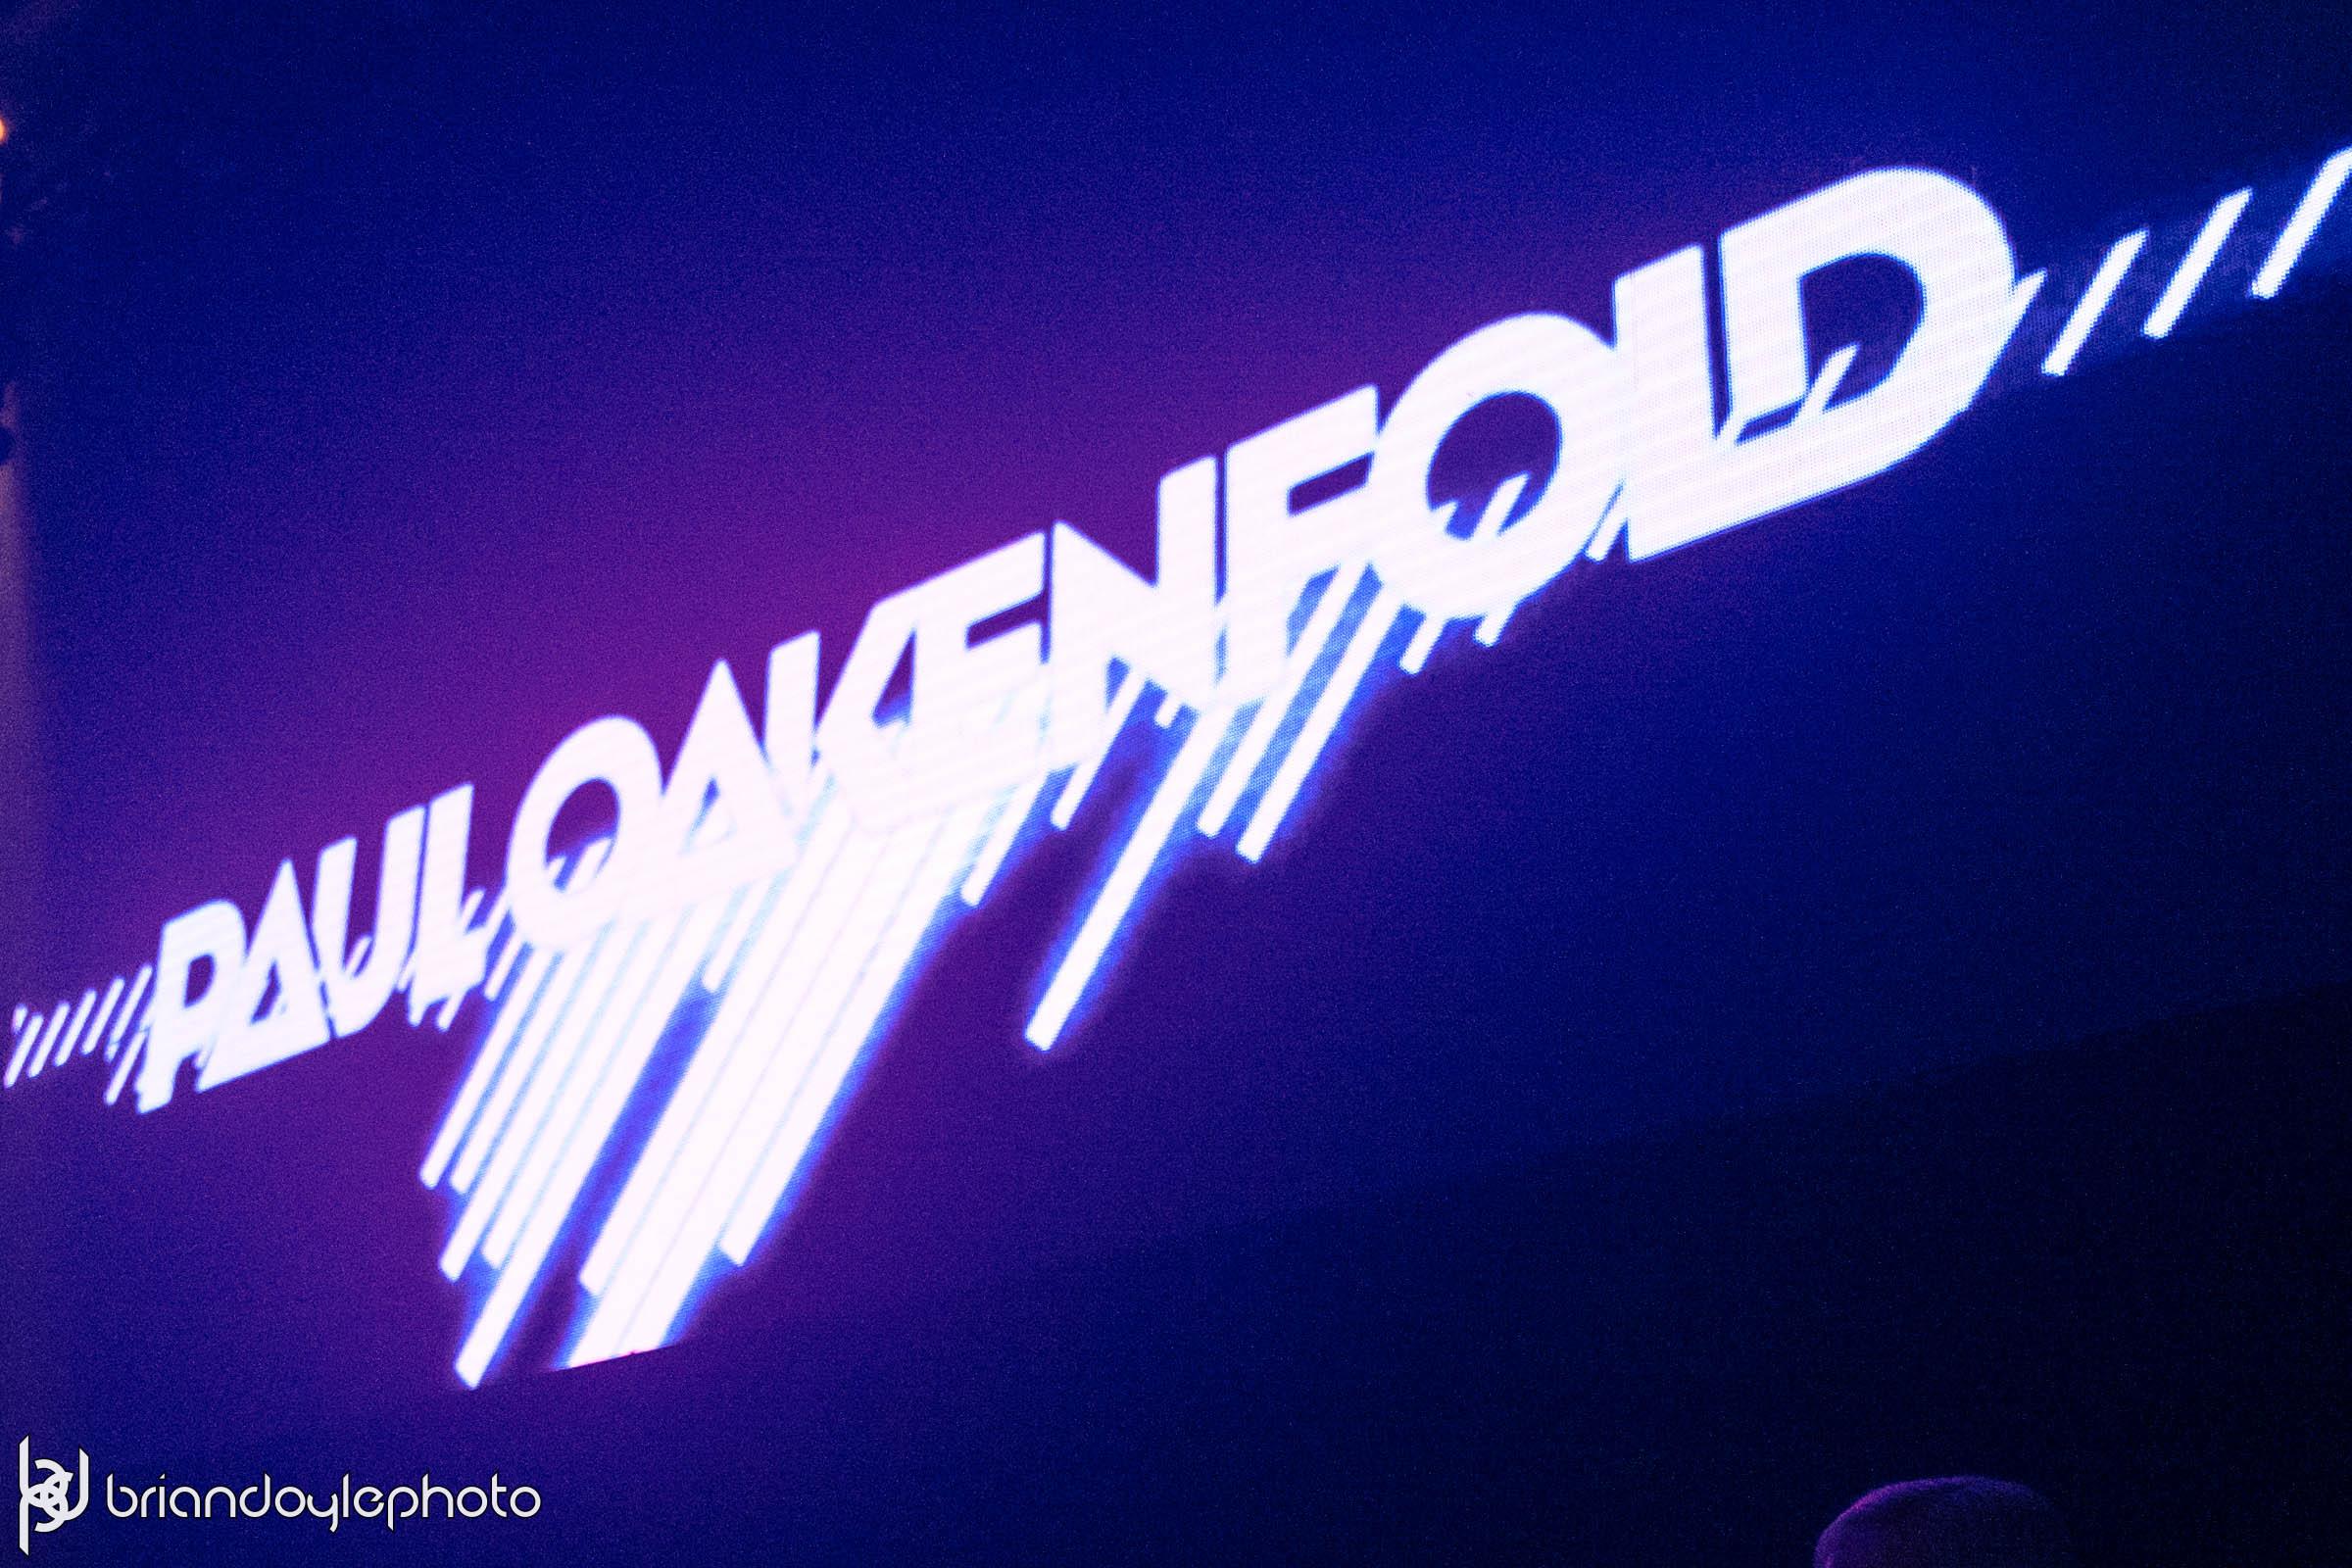 Jagermeister Presents - Paul Oakenfold @ Avalon bdp 27.09.14-44.jpg